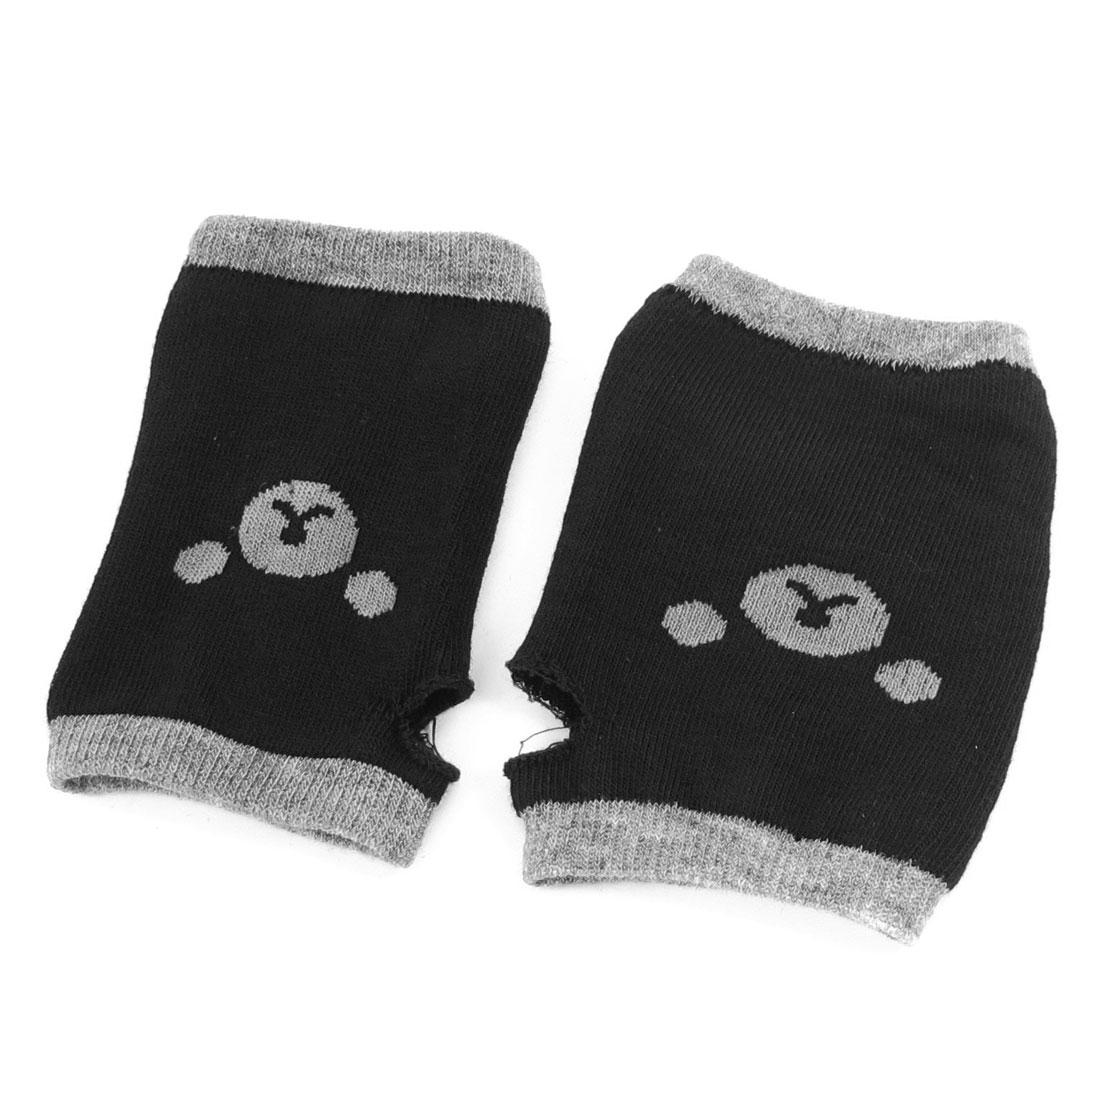 Pair Black Knitted Elasticity Hand Wrist Fingerless Gloves for Lady